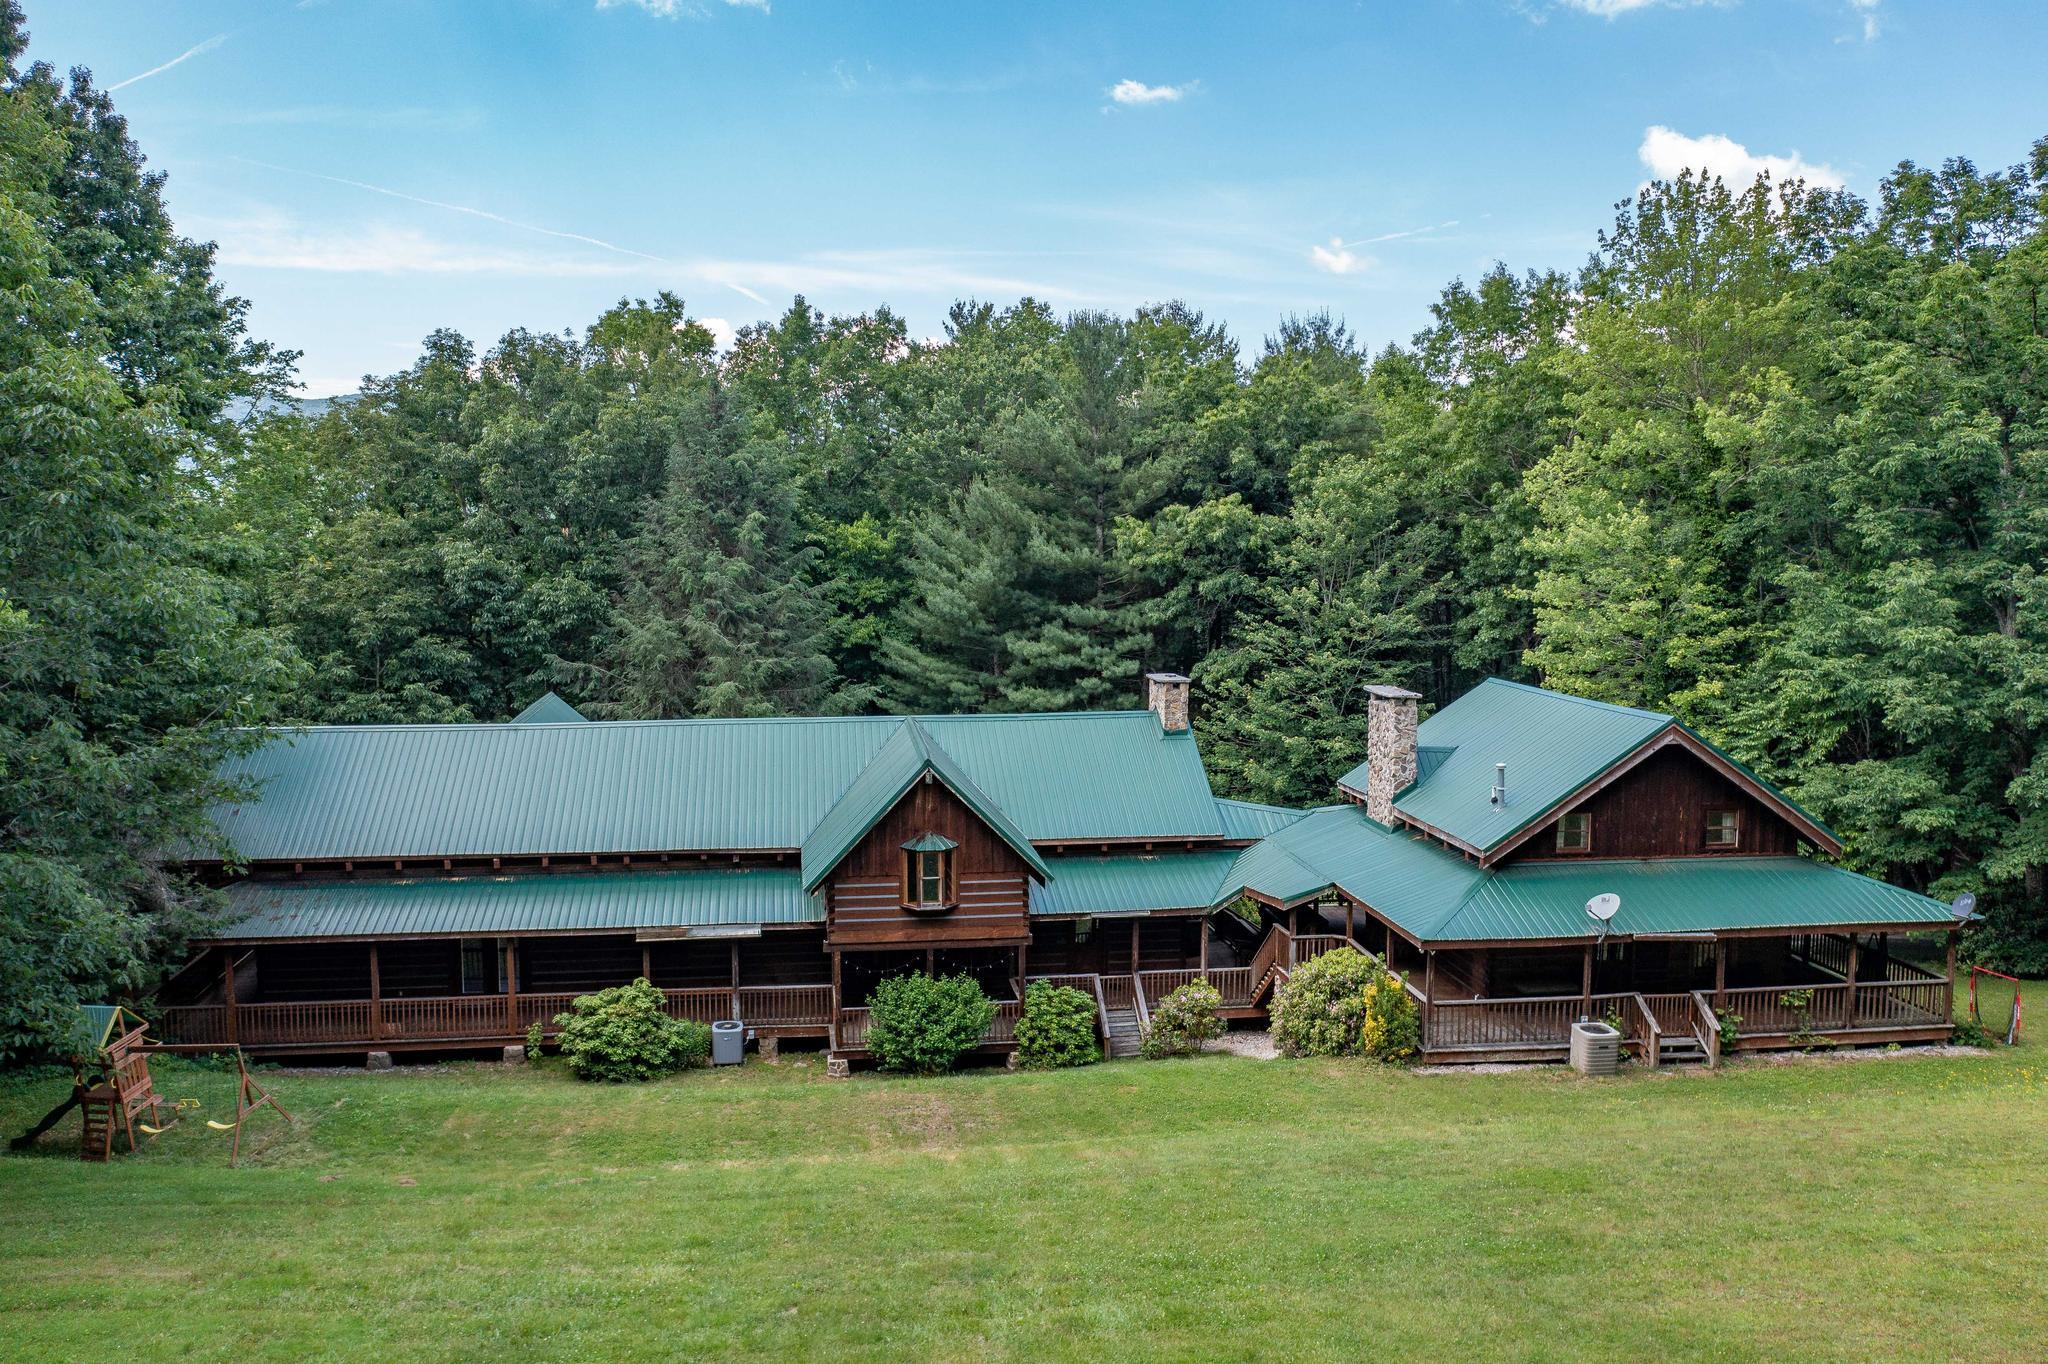 780 Bill Icenhour Lane Lodge Main (28 of